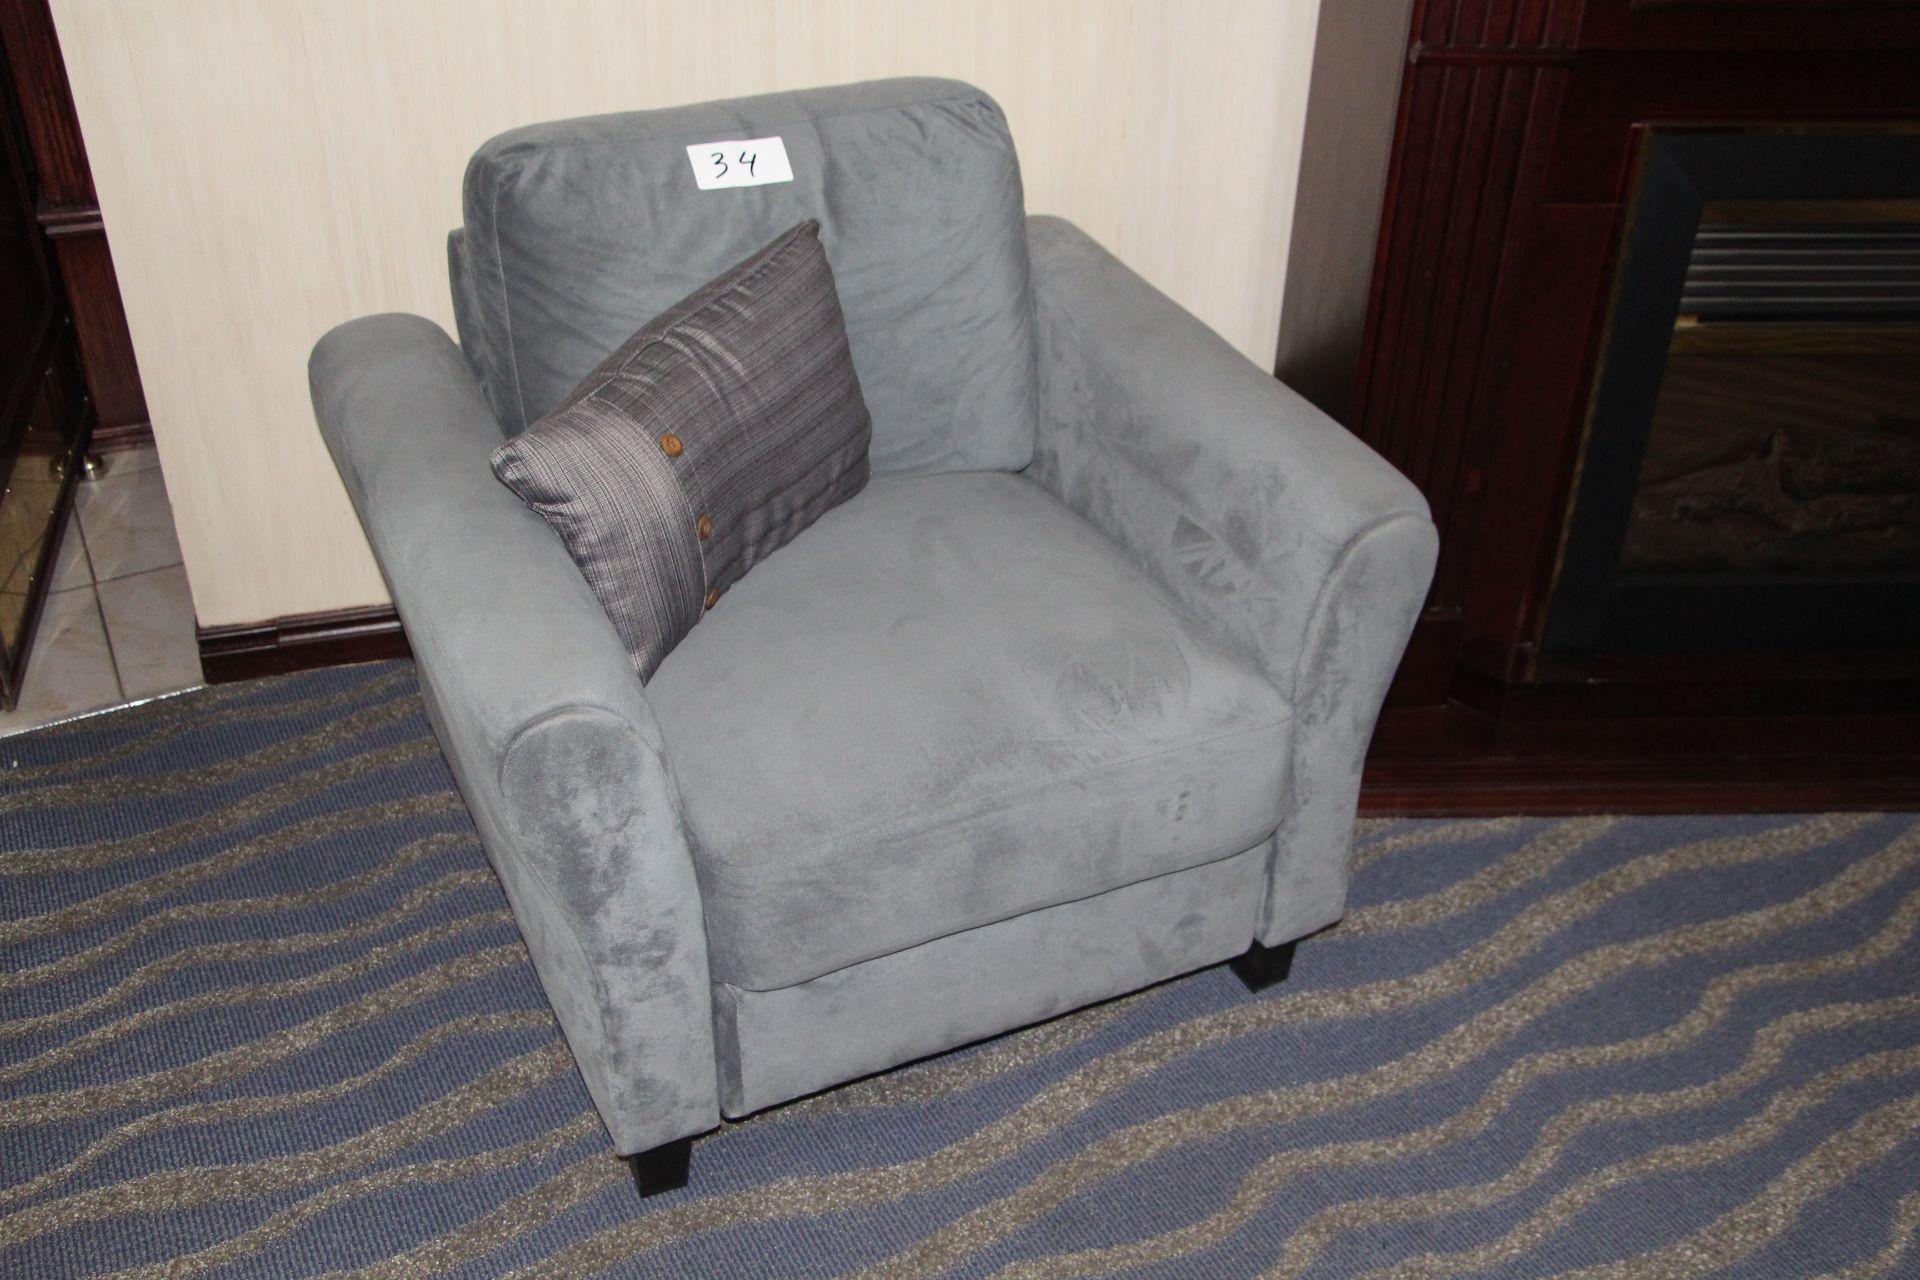 Lot 34 - Fabric armchair w/throw cushion